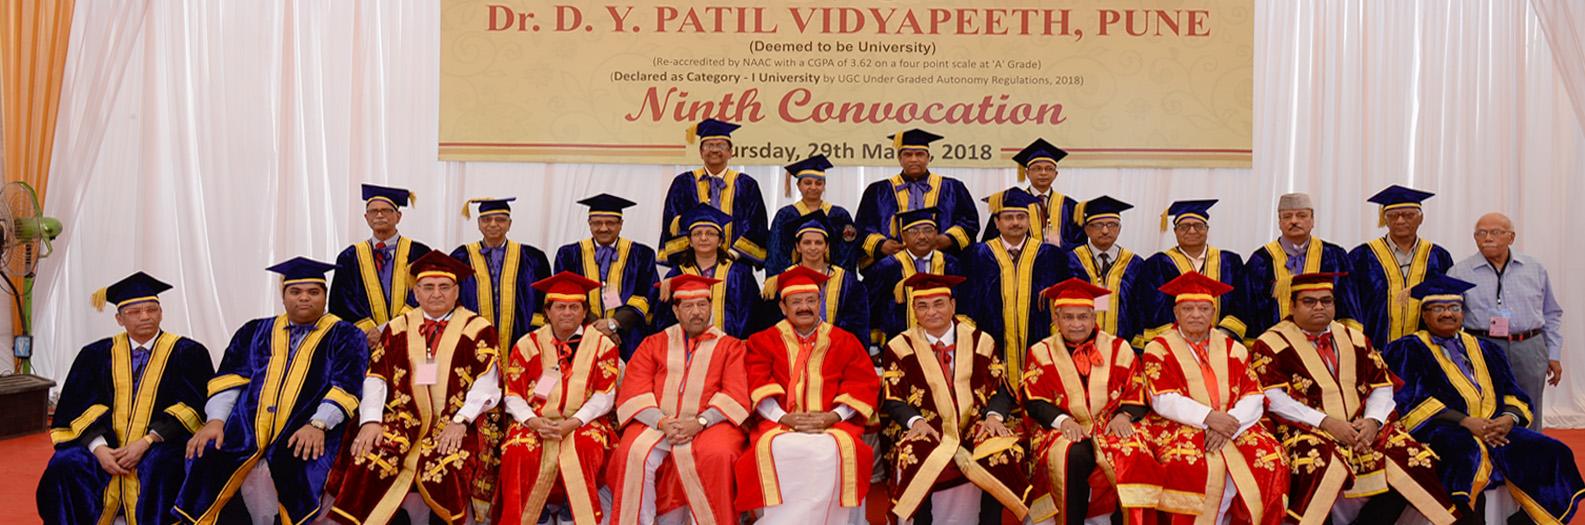 Dr. DY Patil College of Nursing, Pune Image